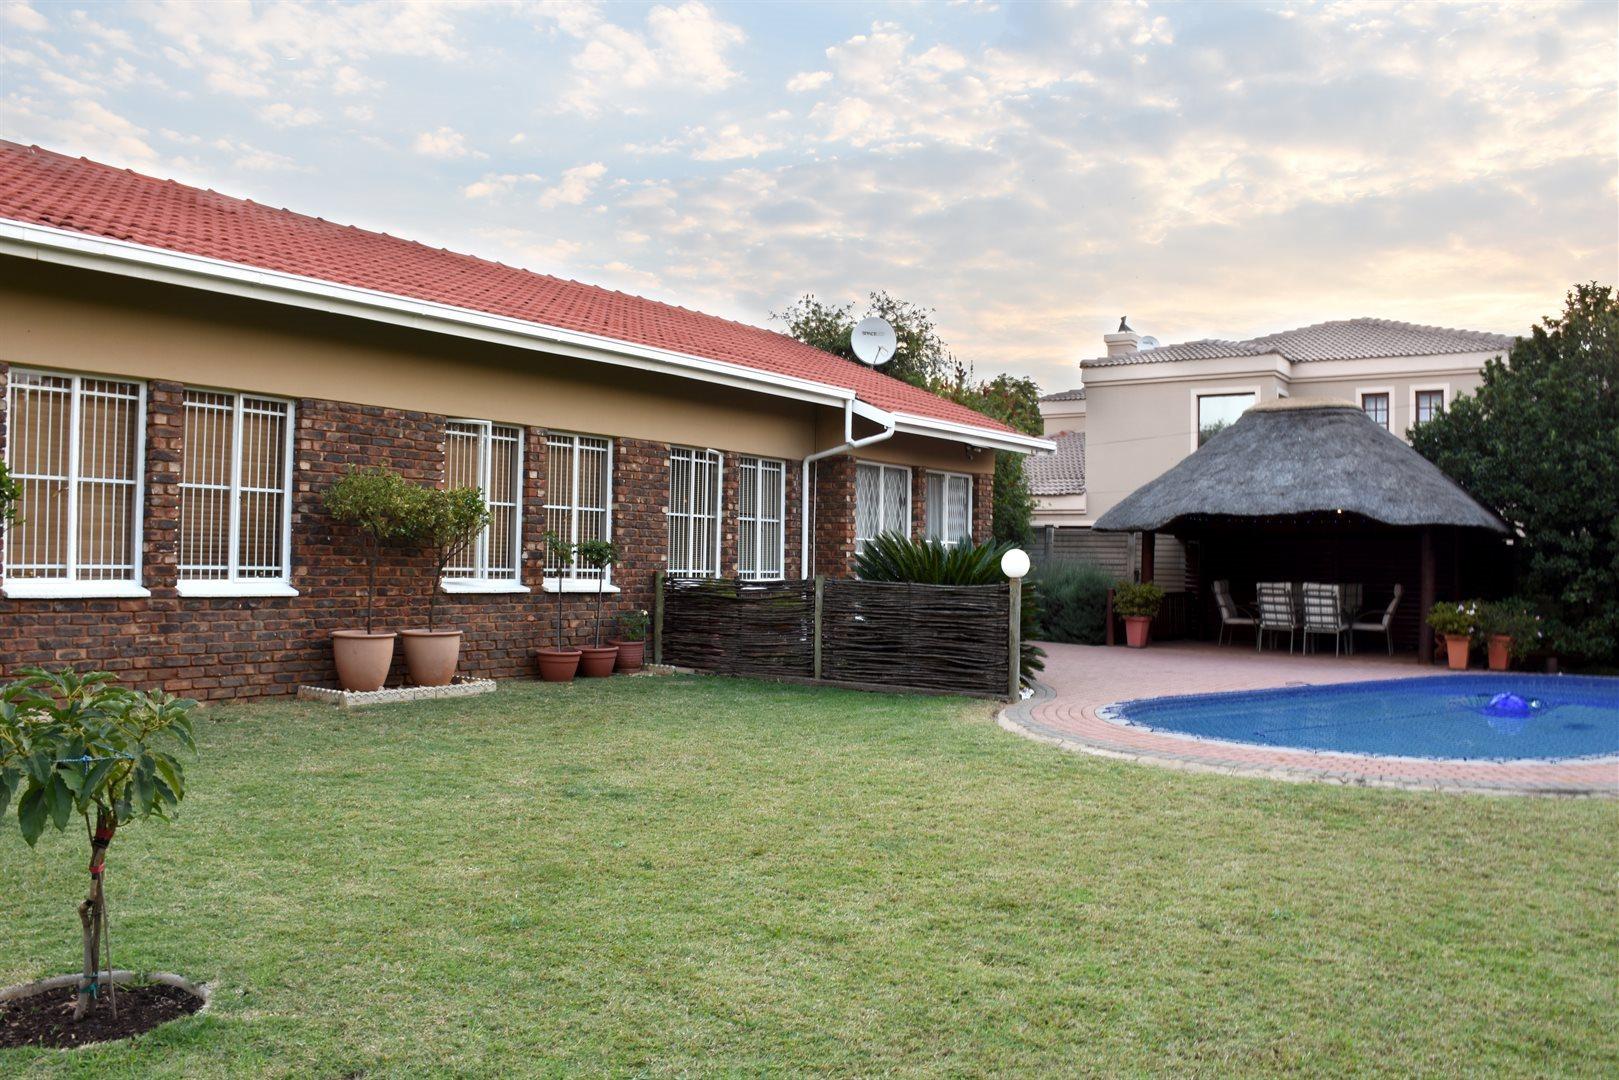 Pretoria, Meyerspark Property  | Houses For Sale Meyerspark, Meyerspark, House 3 bedrooms property for sale Price:1,595,000